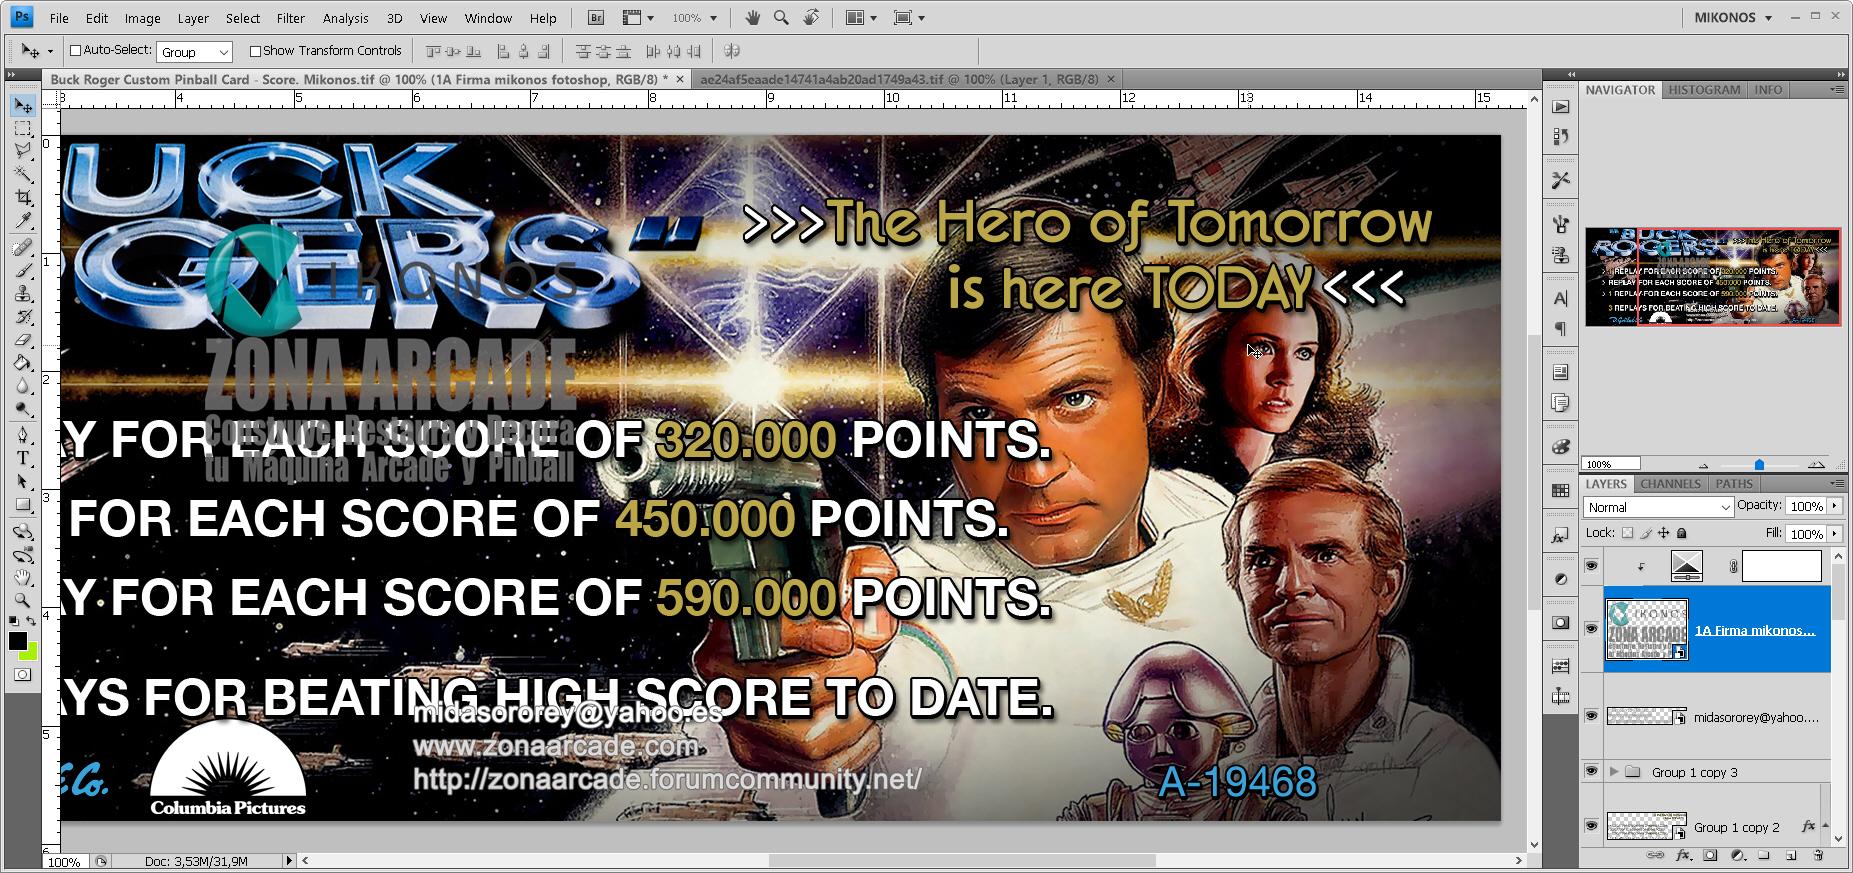 Buck Rogers Pinball Card Customized - Score. Mikonos1